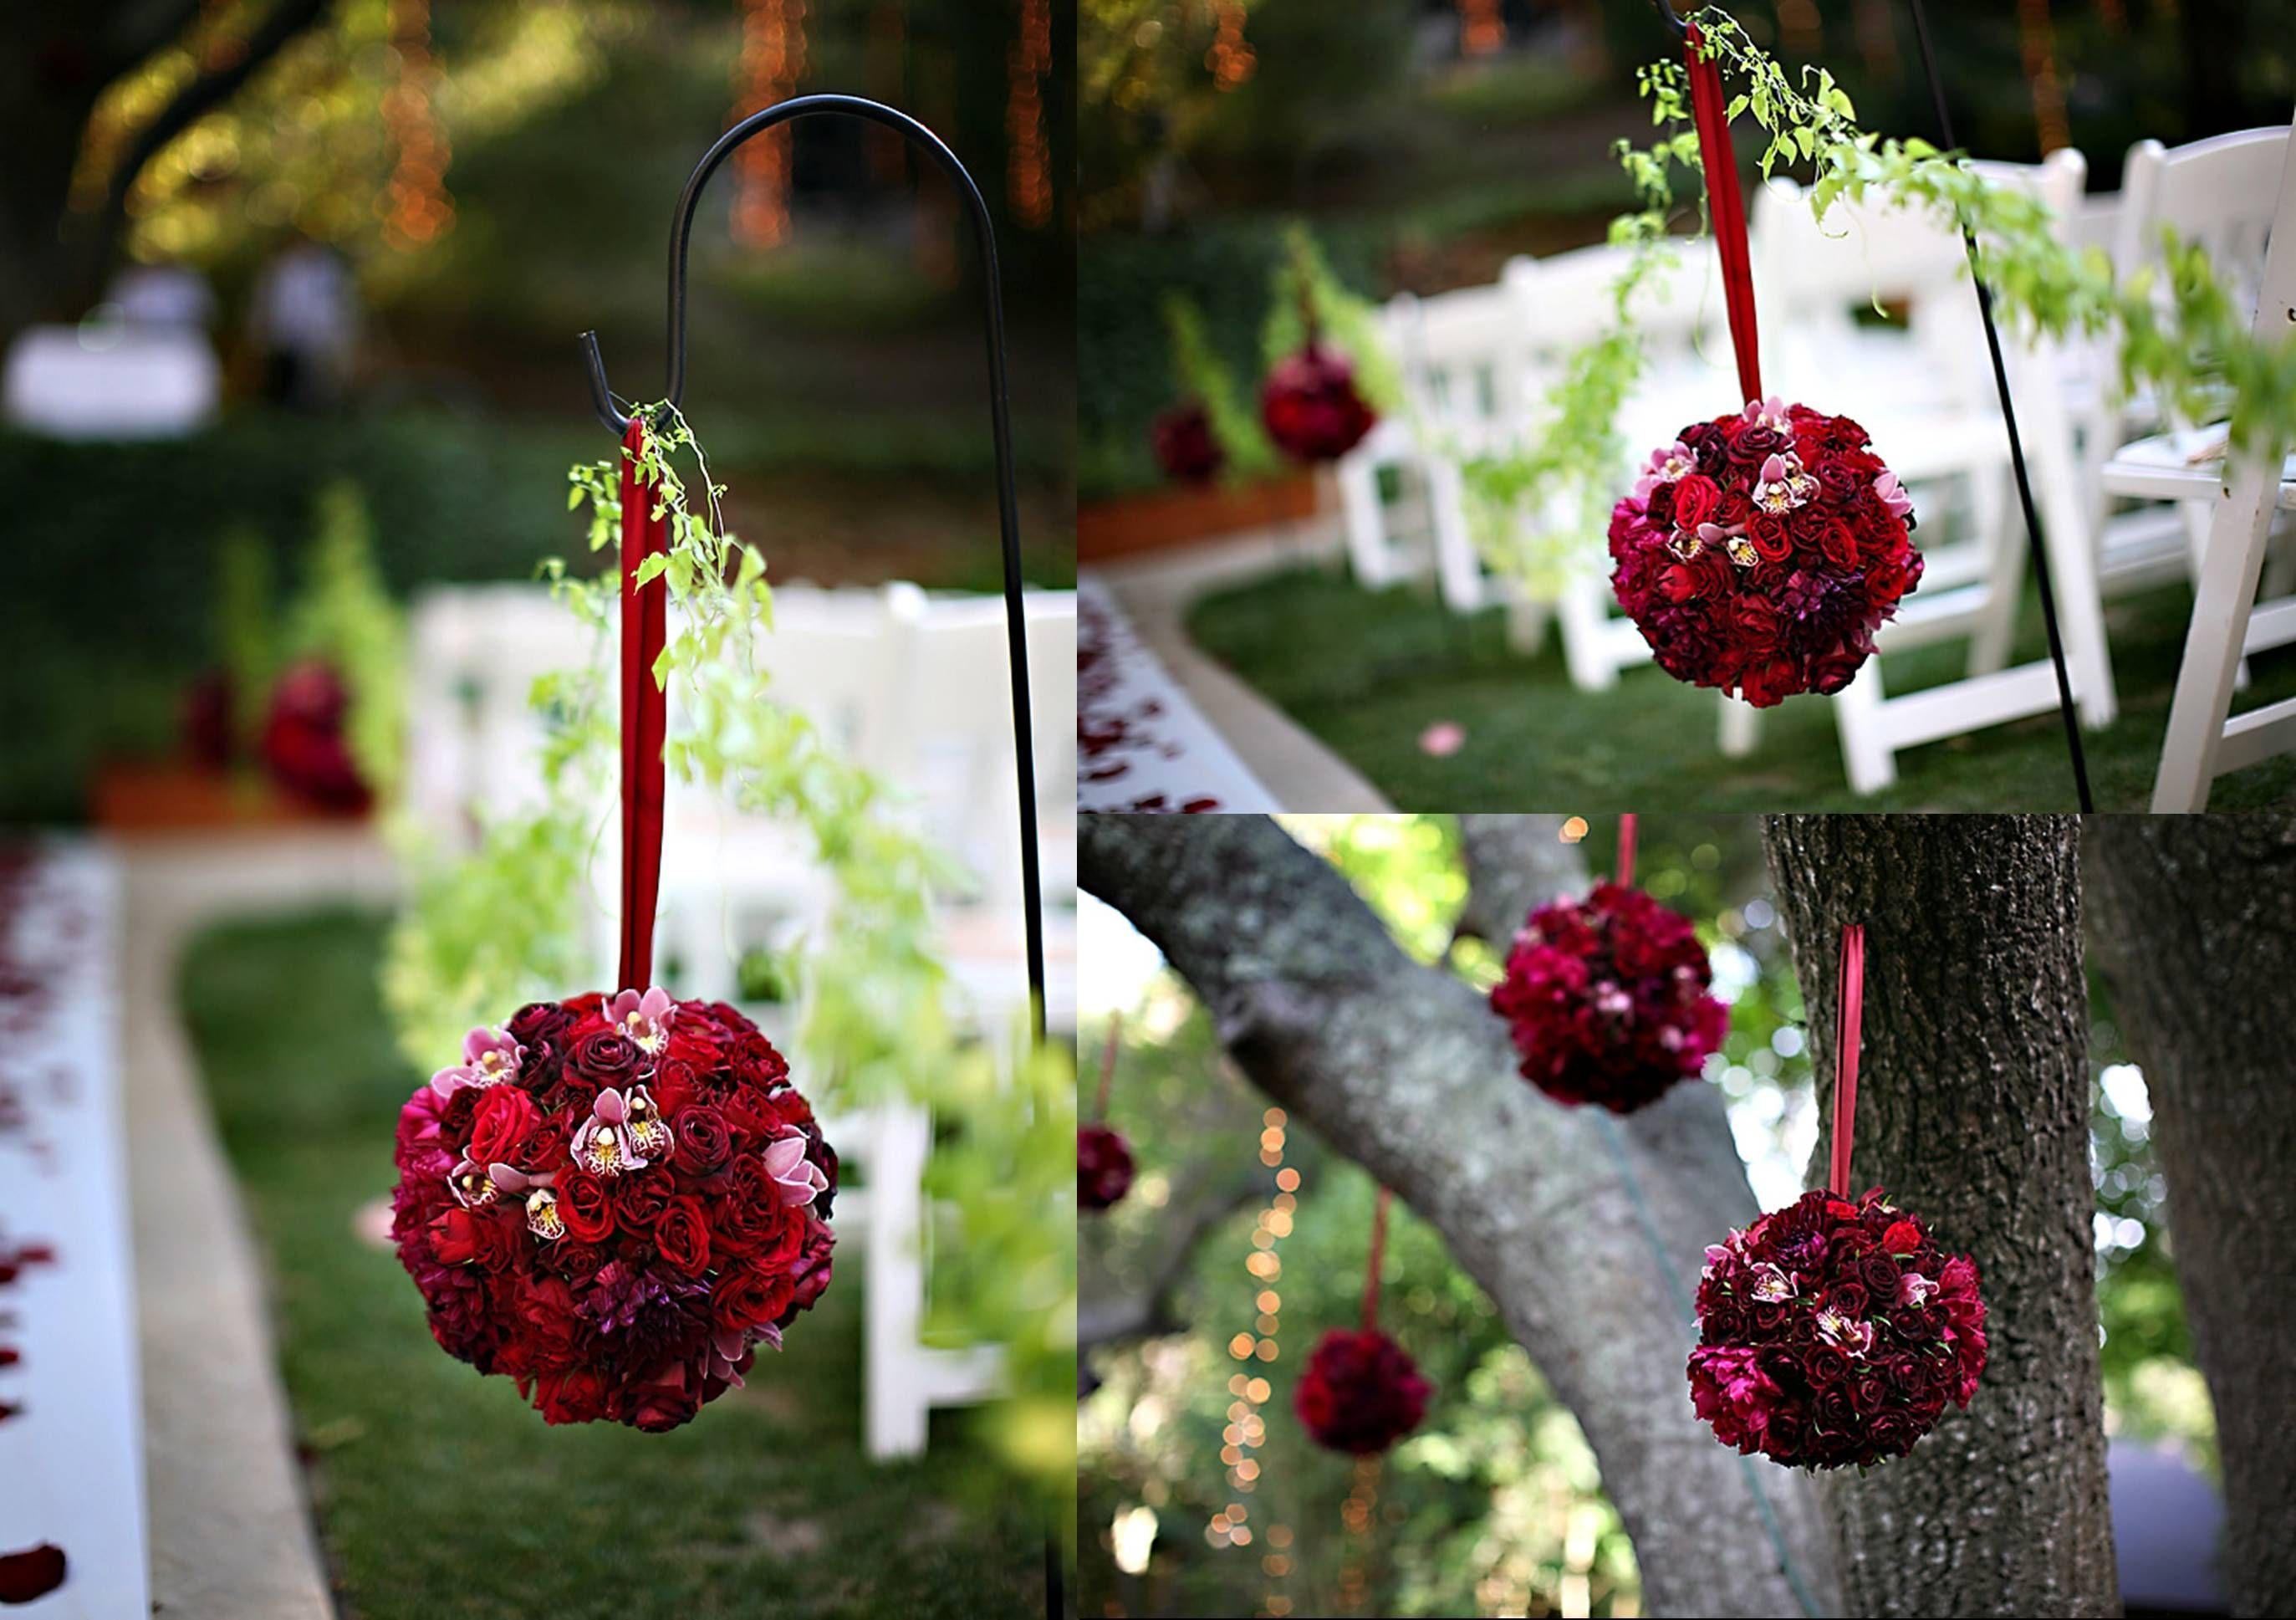 Red Rose Pomander Kissing Rose Balls On Shepherd Hooks Wedding Isle Decoration Hanging Flower Balls Pomander Wedding Flower Ball Red Purple Wedding